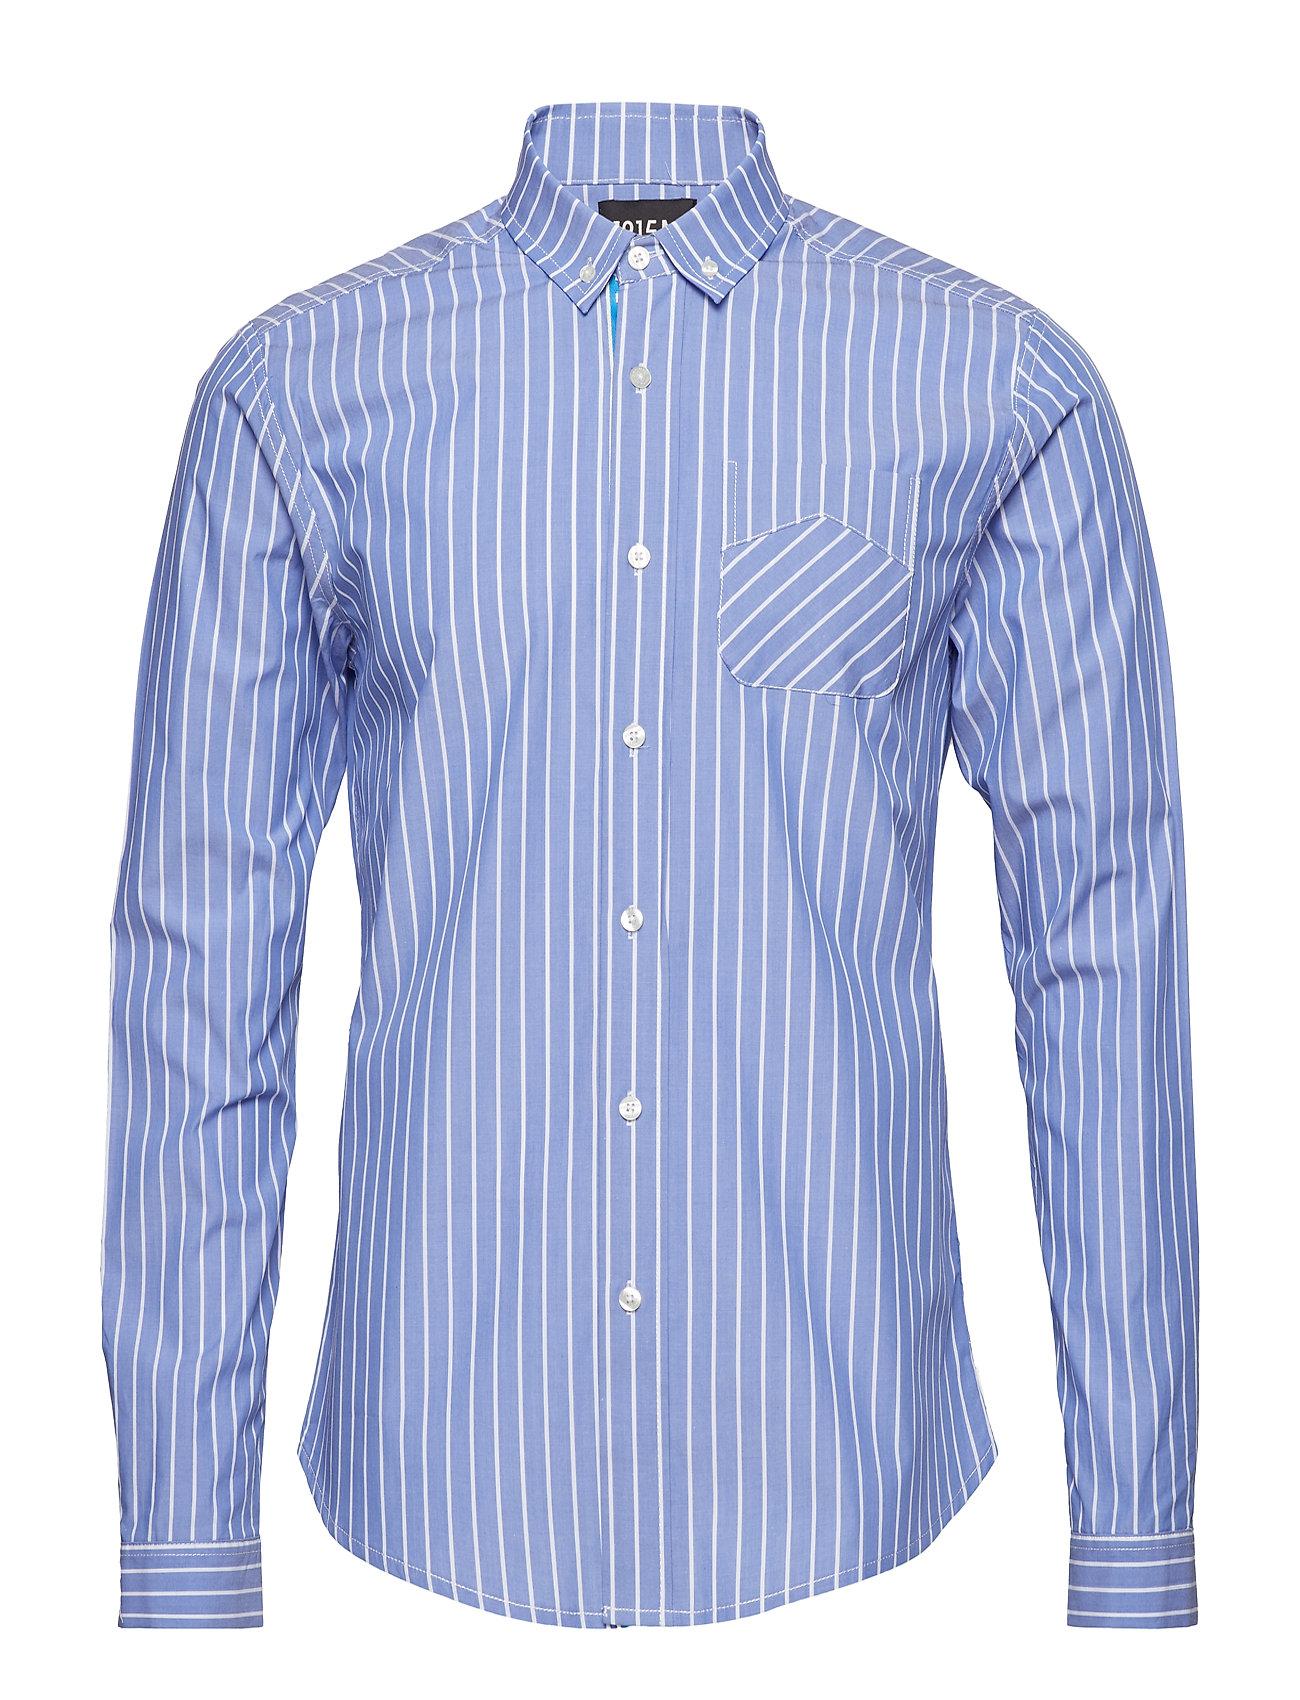 Scotch & Soda Ams Blauw premium dress shirt - COMBO B